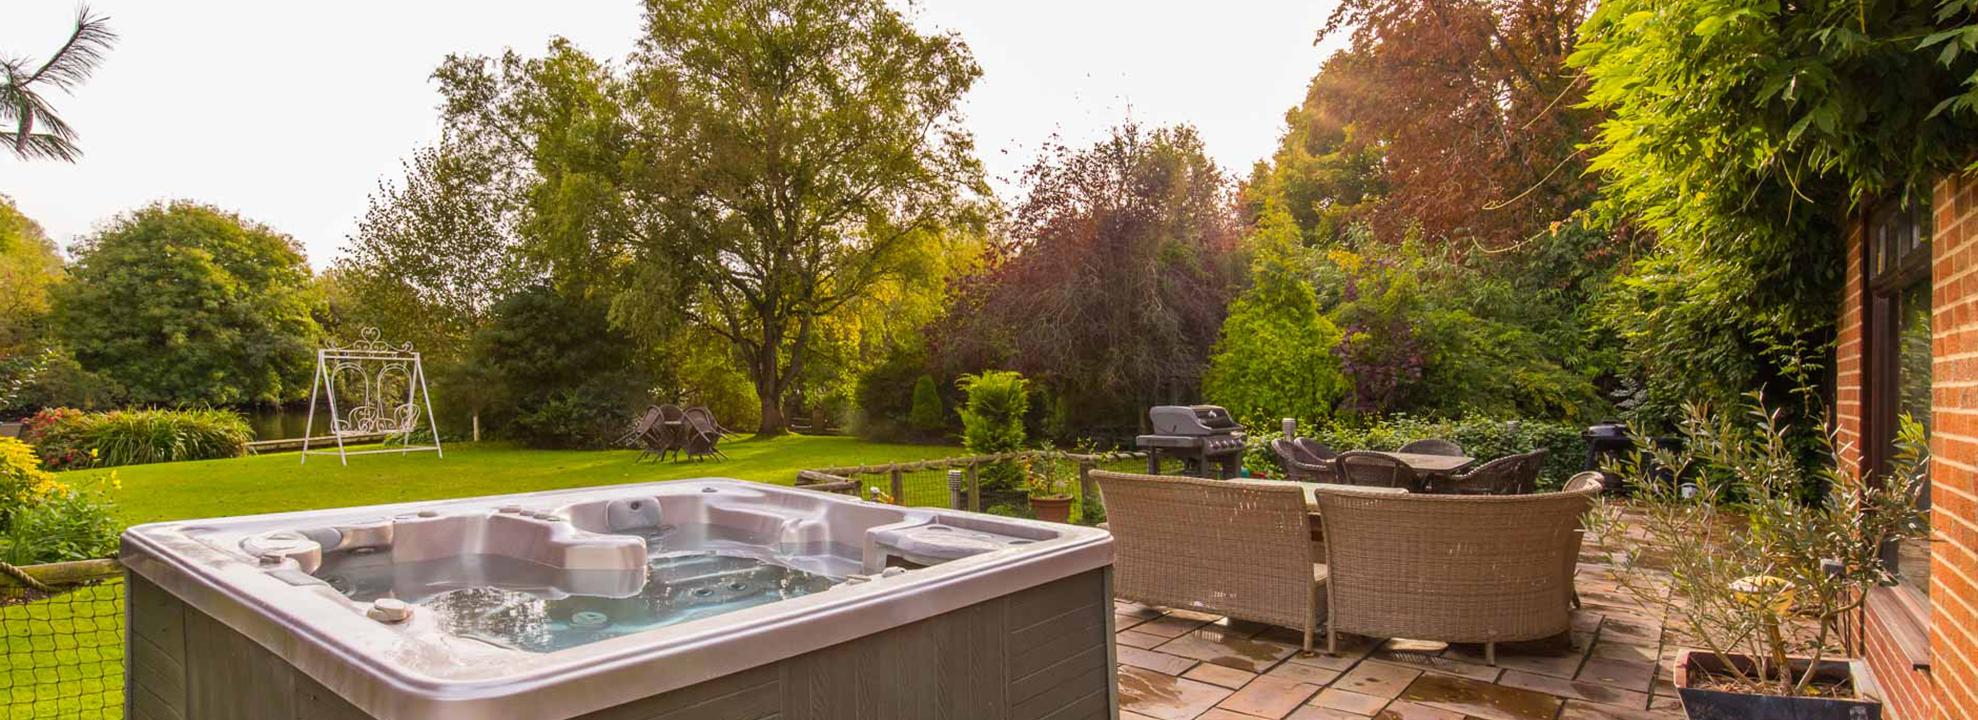 Four Seasons riverside garden and hot tub.